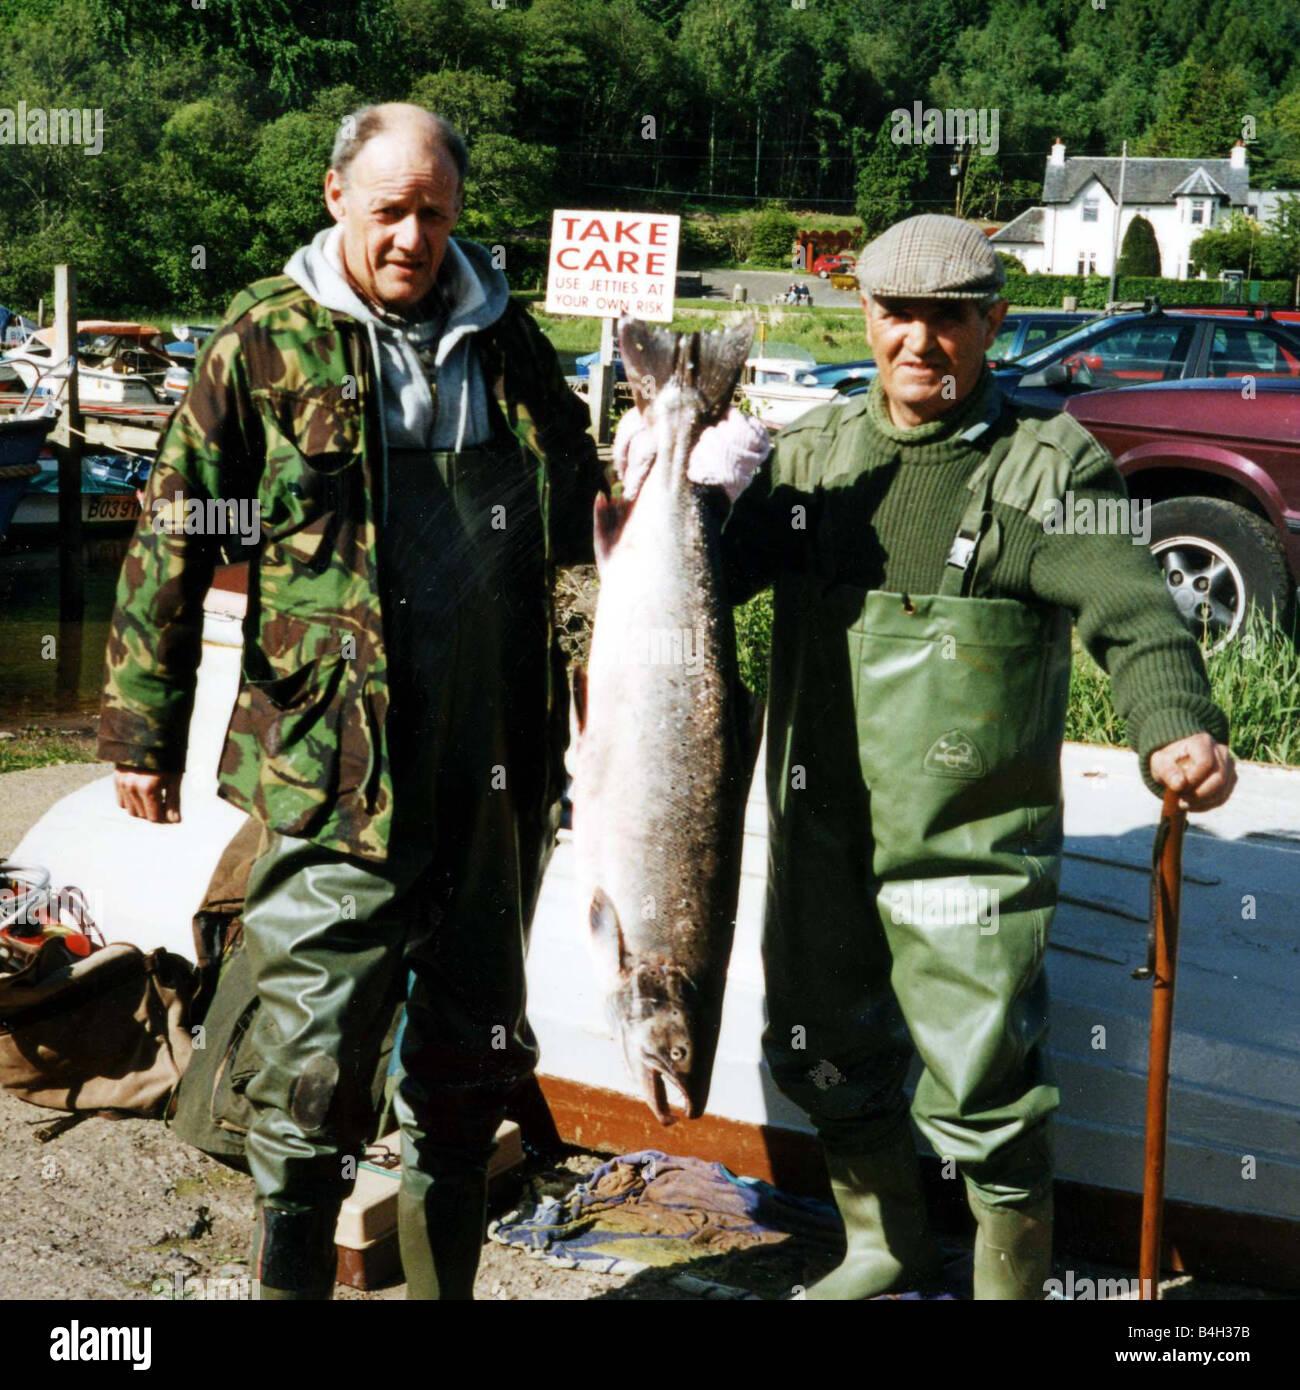 FISH OF THE WEEK WINNER September 2001 EDDIE VENTISEI HOLDING FISH WITH ROBERT PERRATT - Stock Image